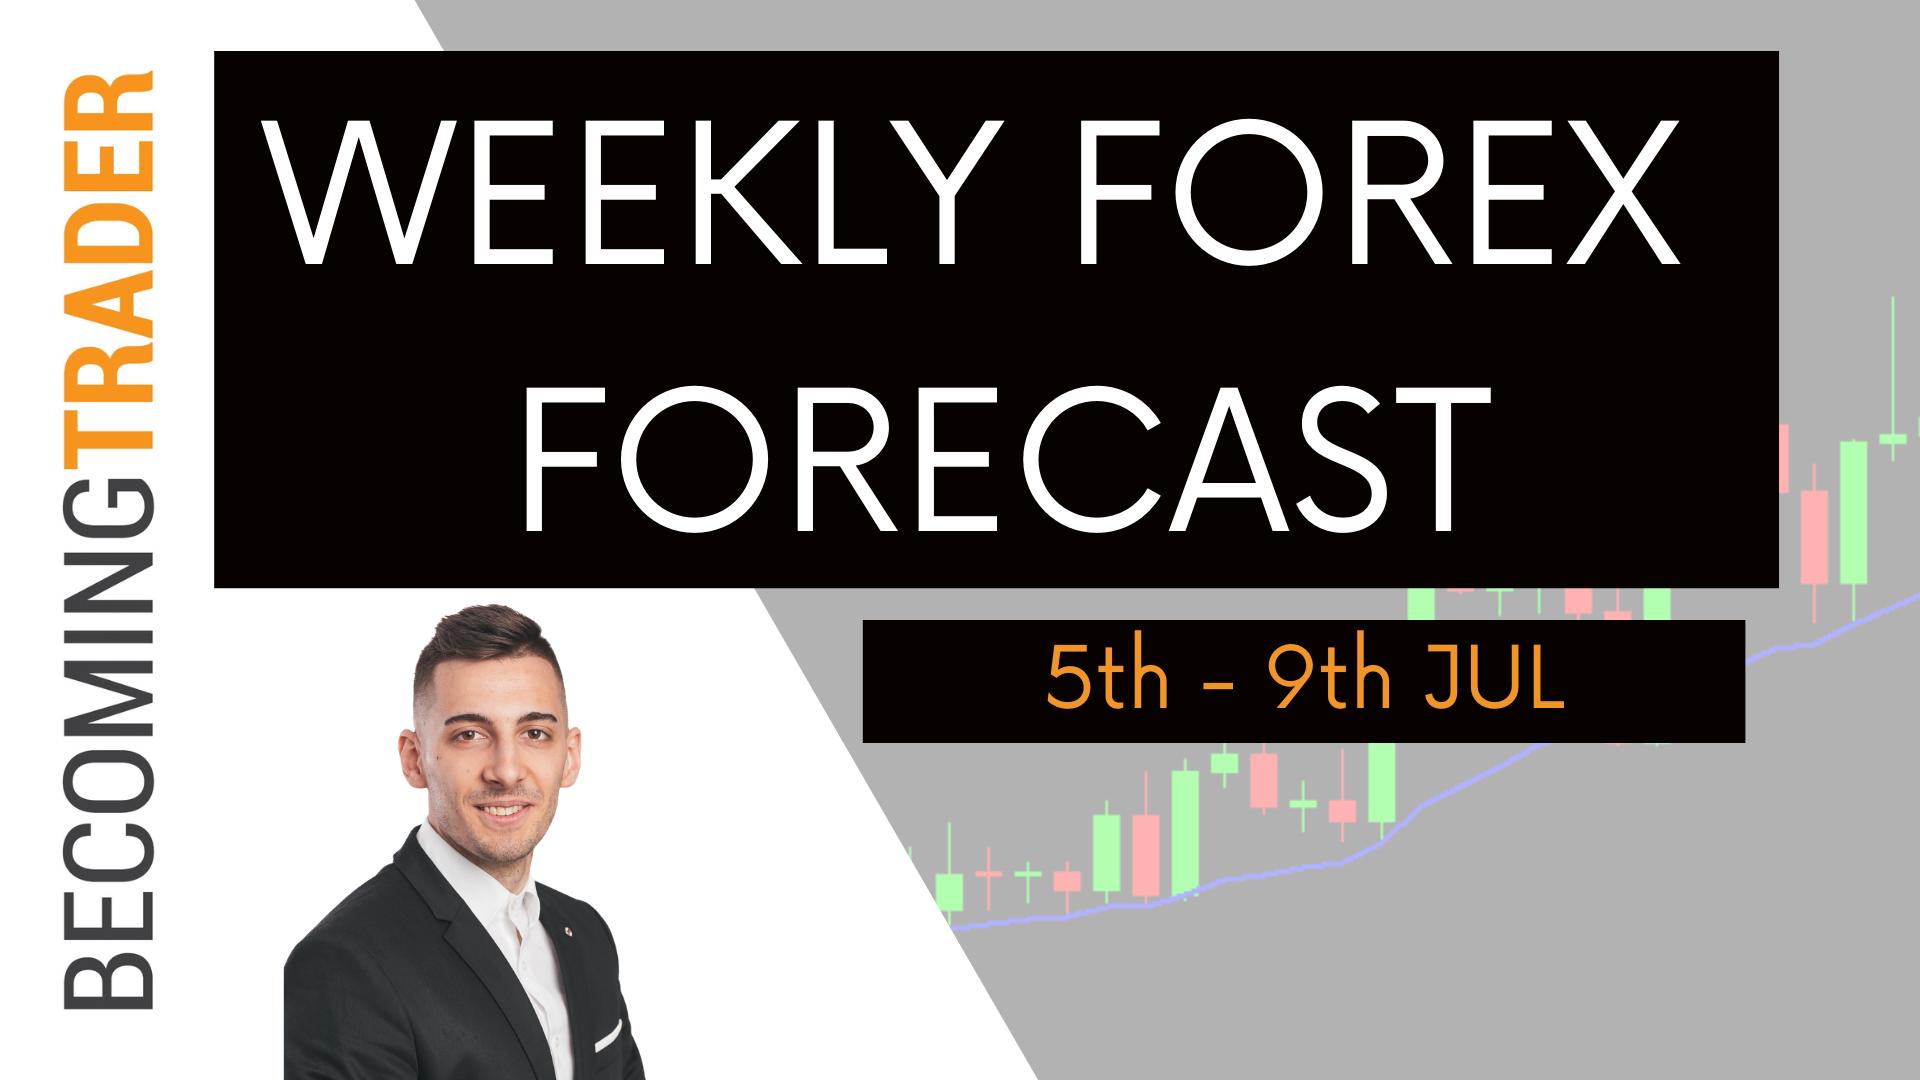 Weekly Forex Forecast 5th to 9th July 2021 | EURUSD , GBPUSD , AUDUSD , NZDUSD , USDCAD , USDJPY